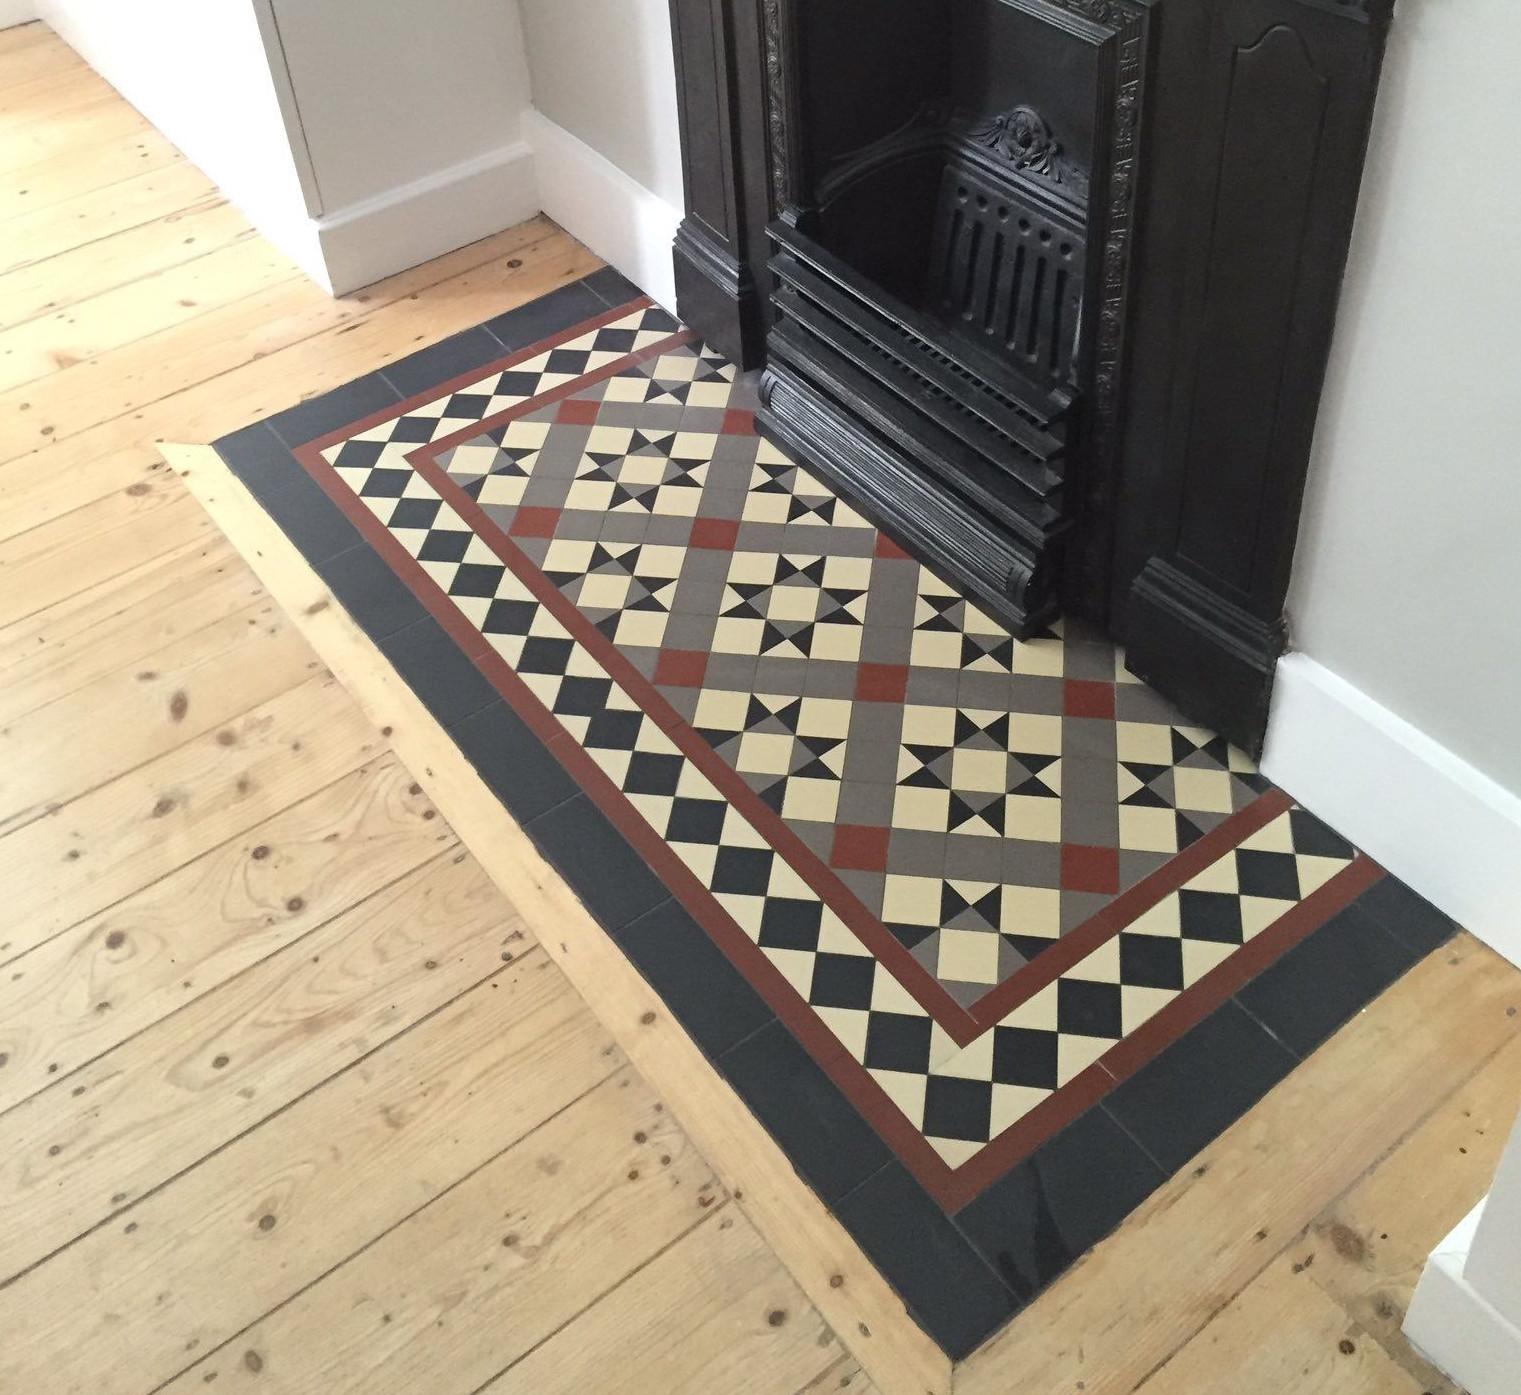 tiling over broken fireplace hearth